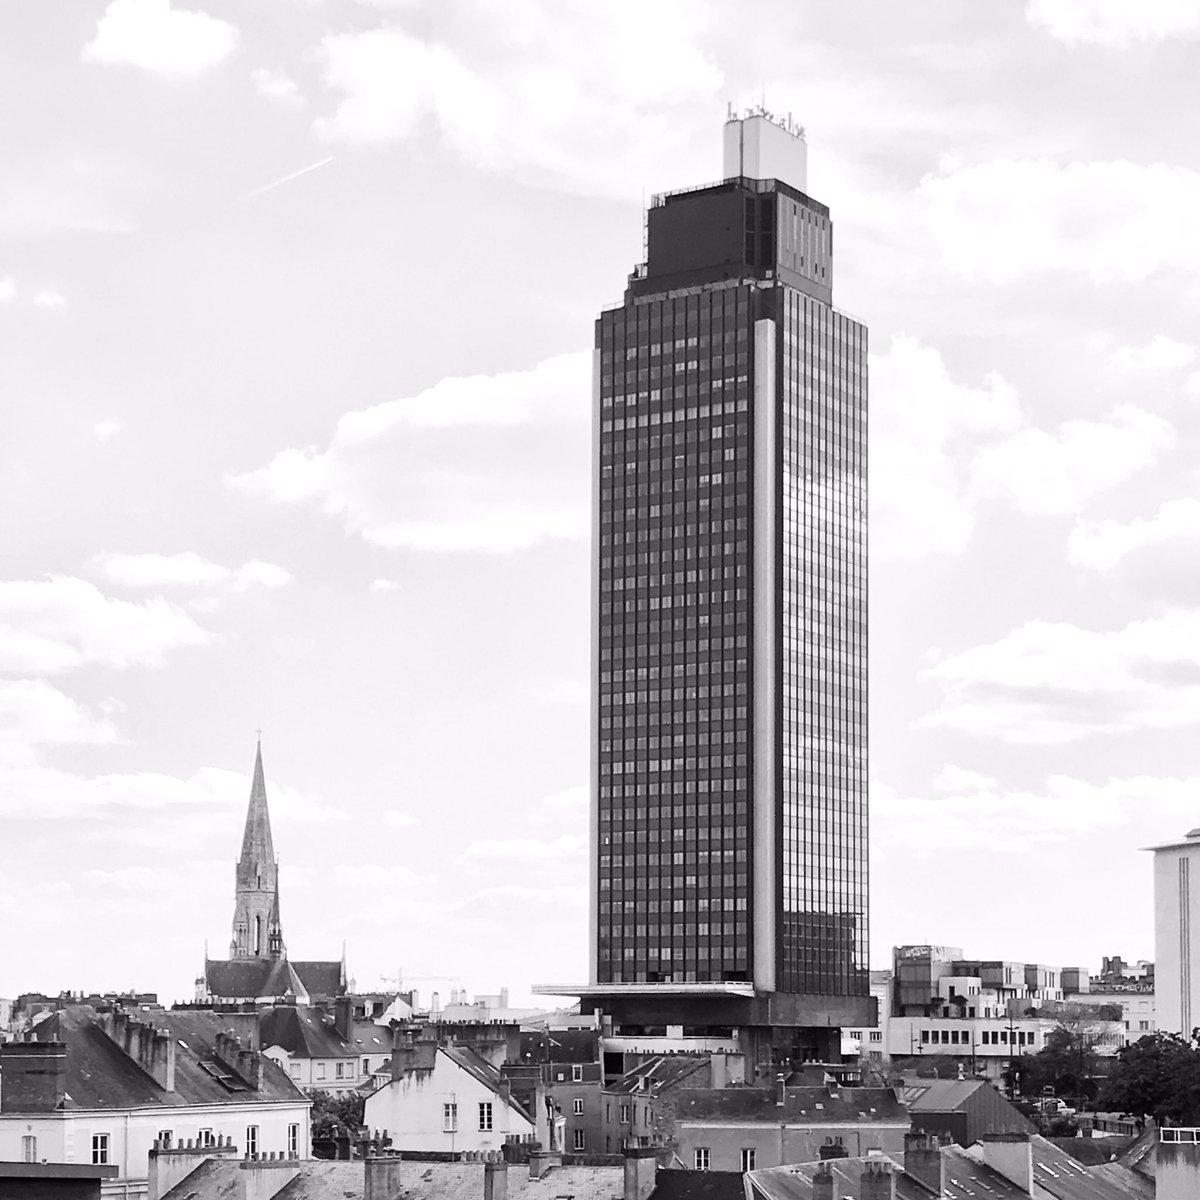 #nantes #architecture #niceview #tourbretagne pic.twitter.com/xRWwDHH1zc